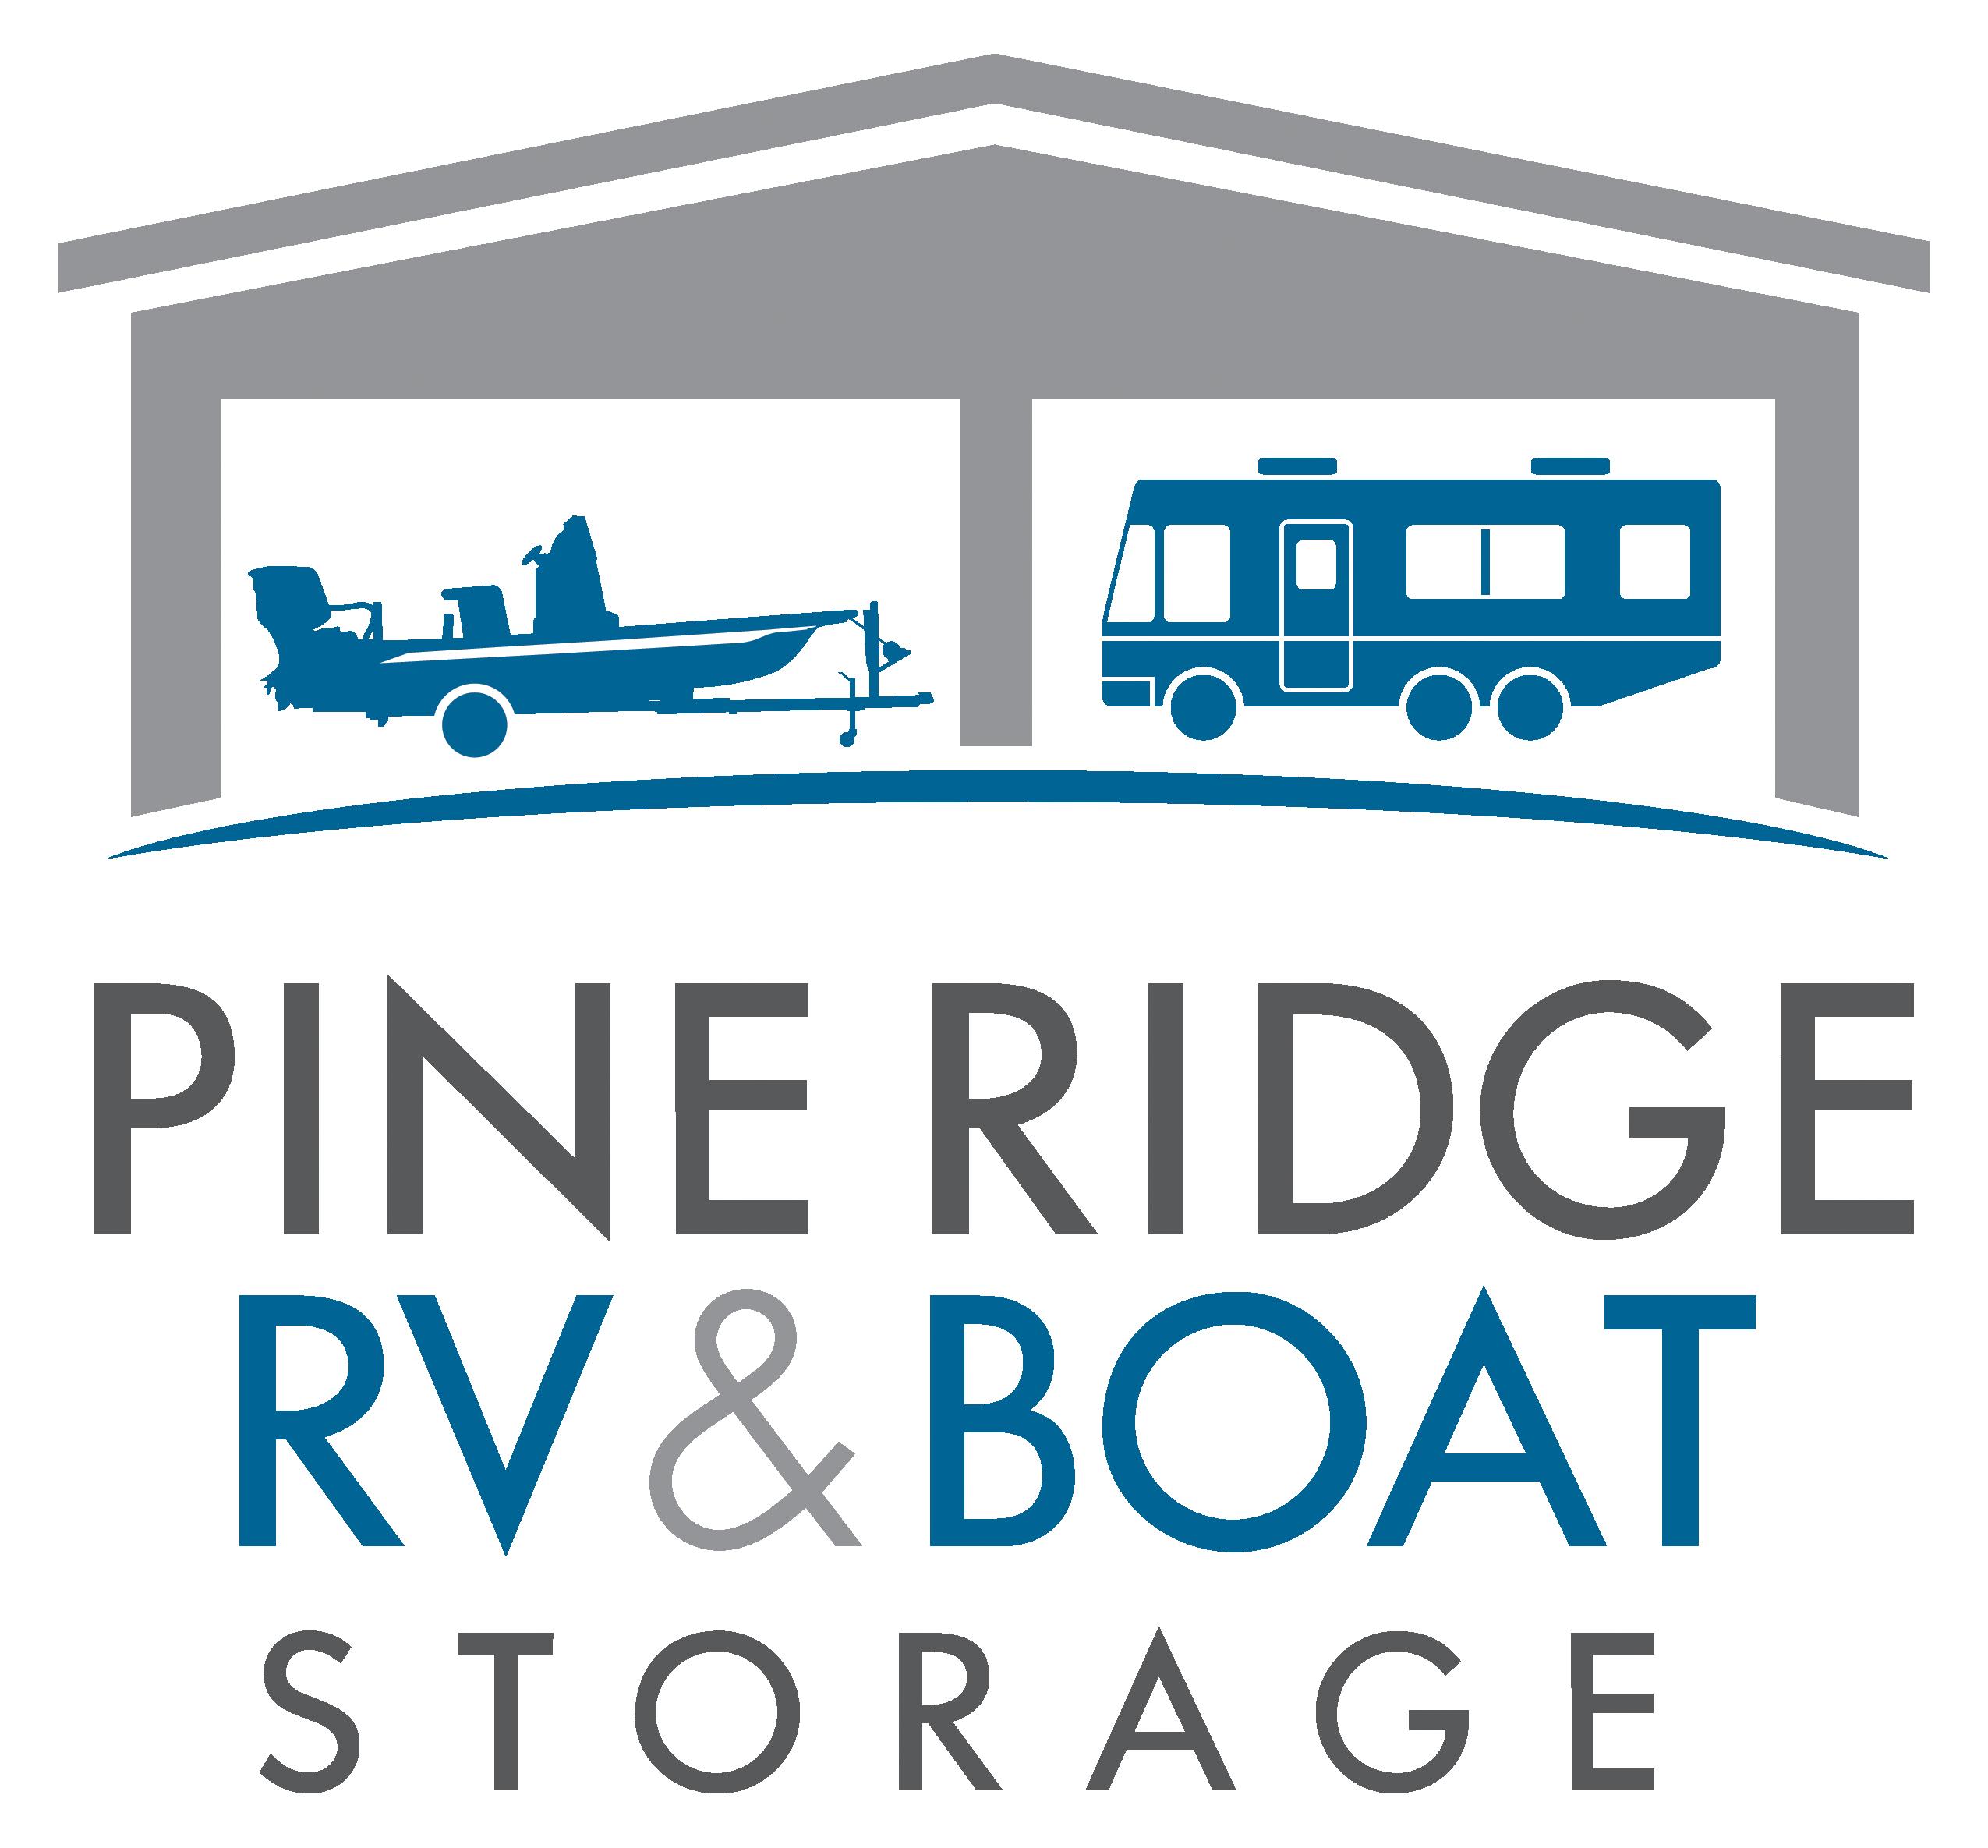 Pine-Ridge-RV-Boat-Logo